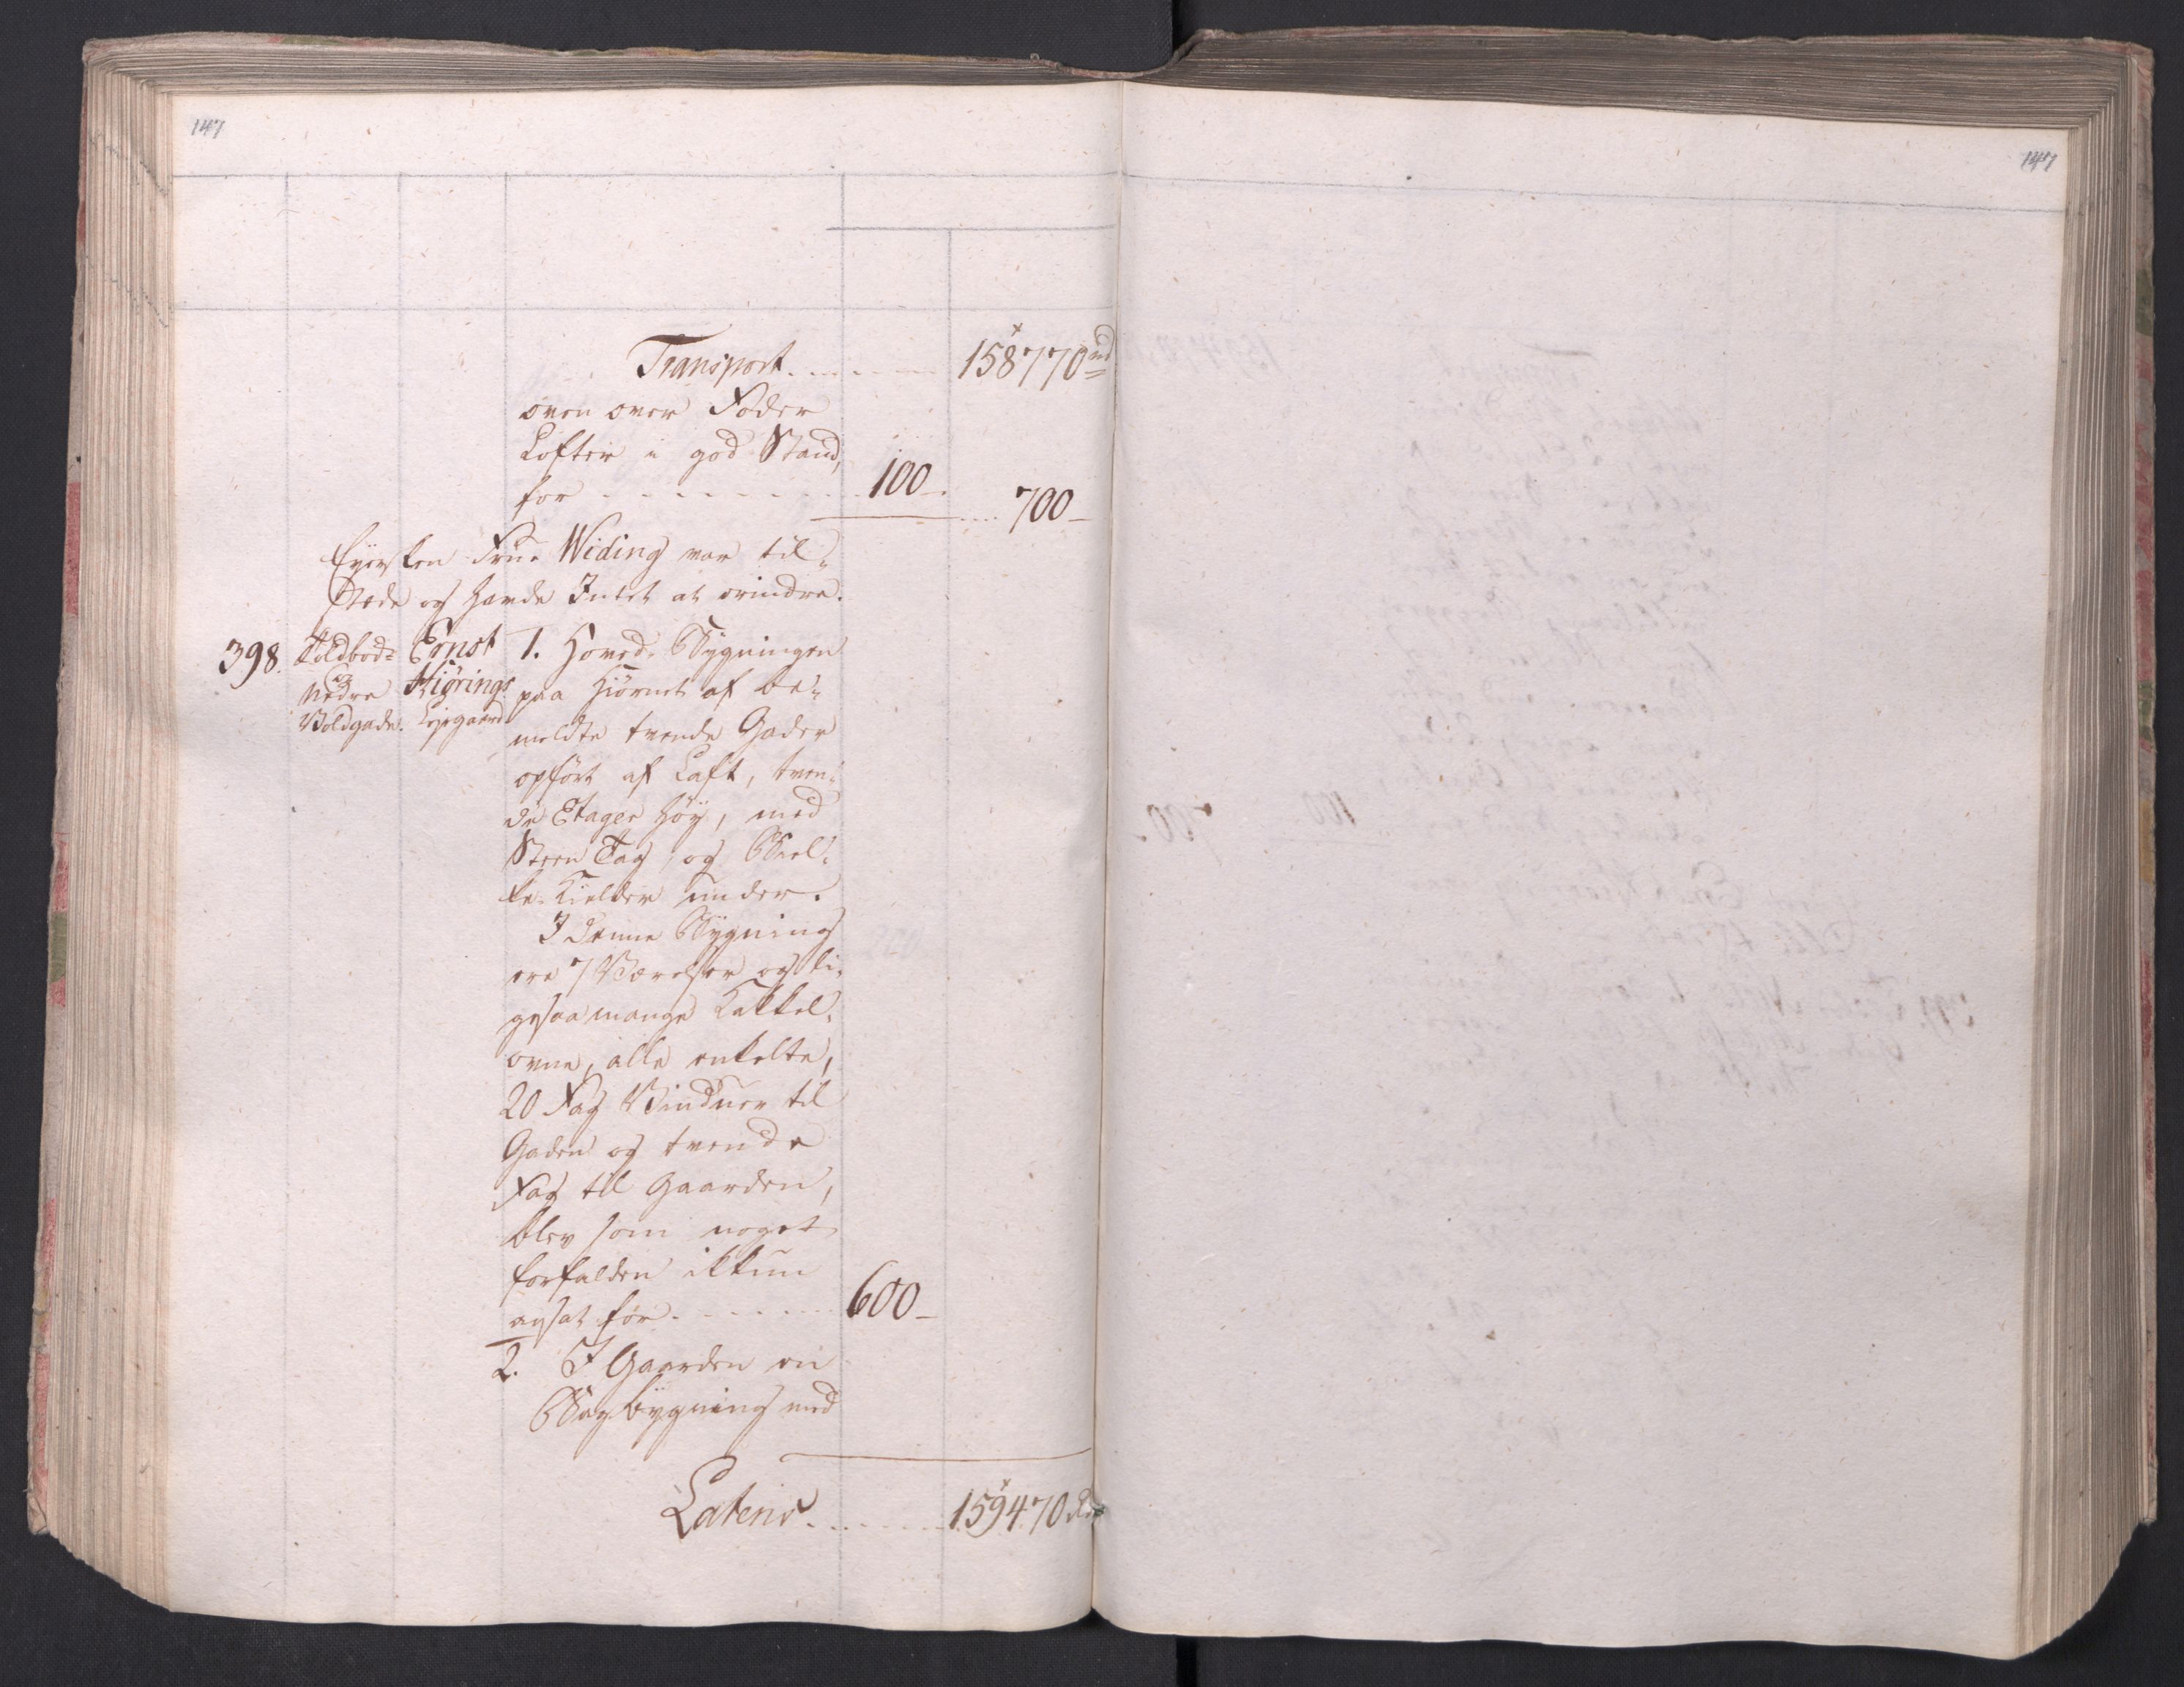 SAO, Kristiania stiftamt, I/Ia/L0015: Branntakster, 1797, s. 147